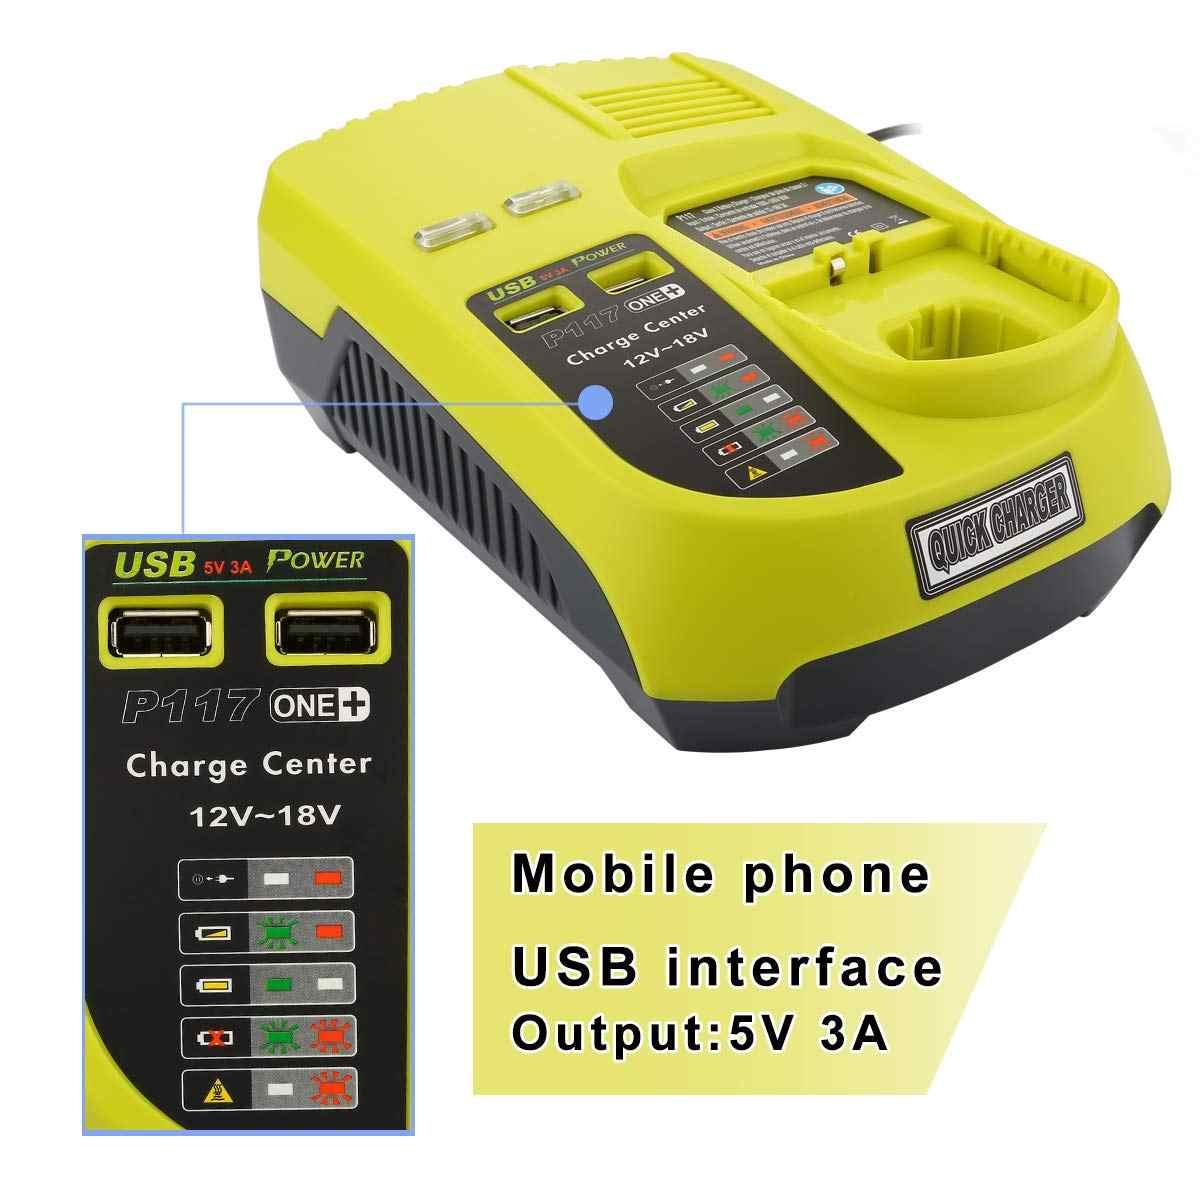 OPQ-3A 12V 14.4V 18V Ryobi P117 şarj edilebilir pil Şarj Cihazı Pil Paketi Güç Aracı Ni-cd Ni-Mh li-Ion P110, p111, P107, P